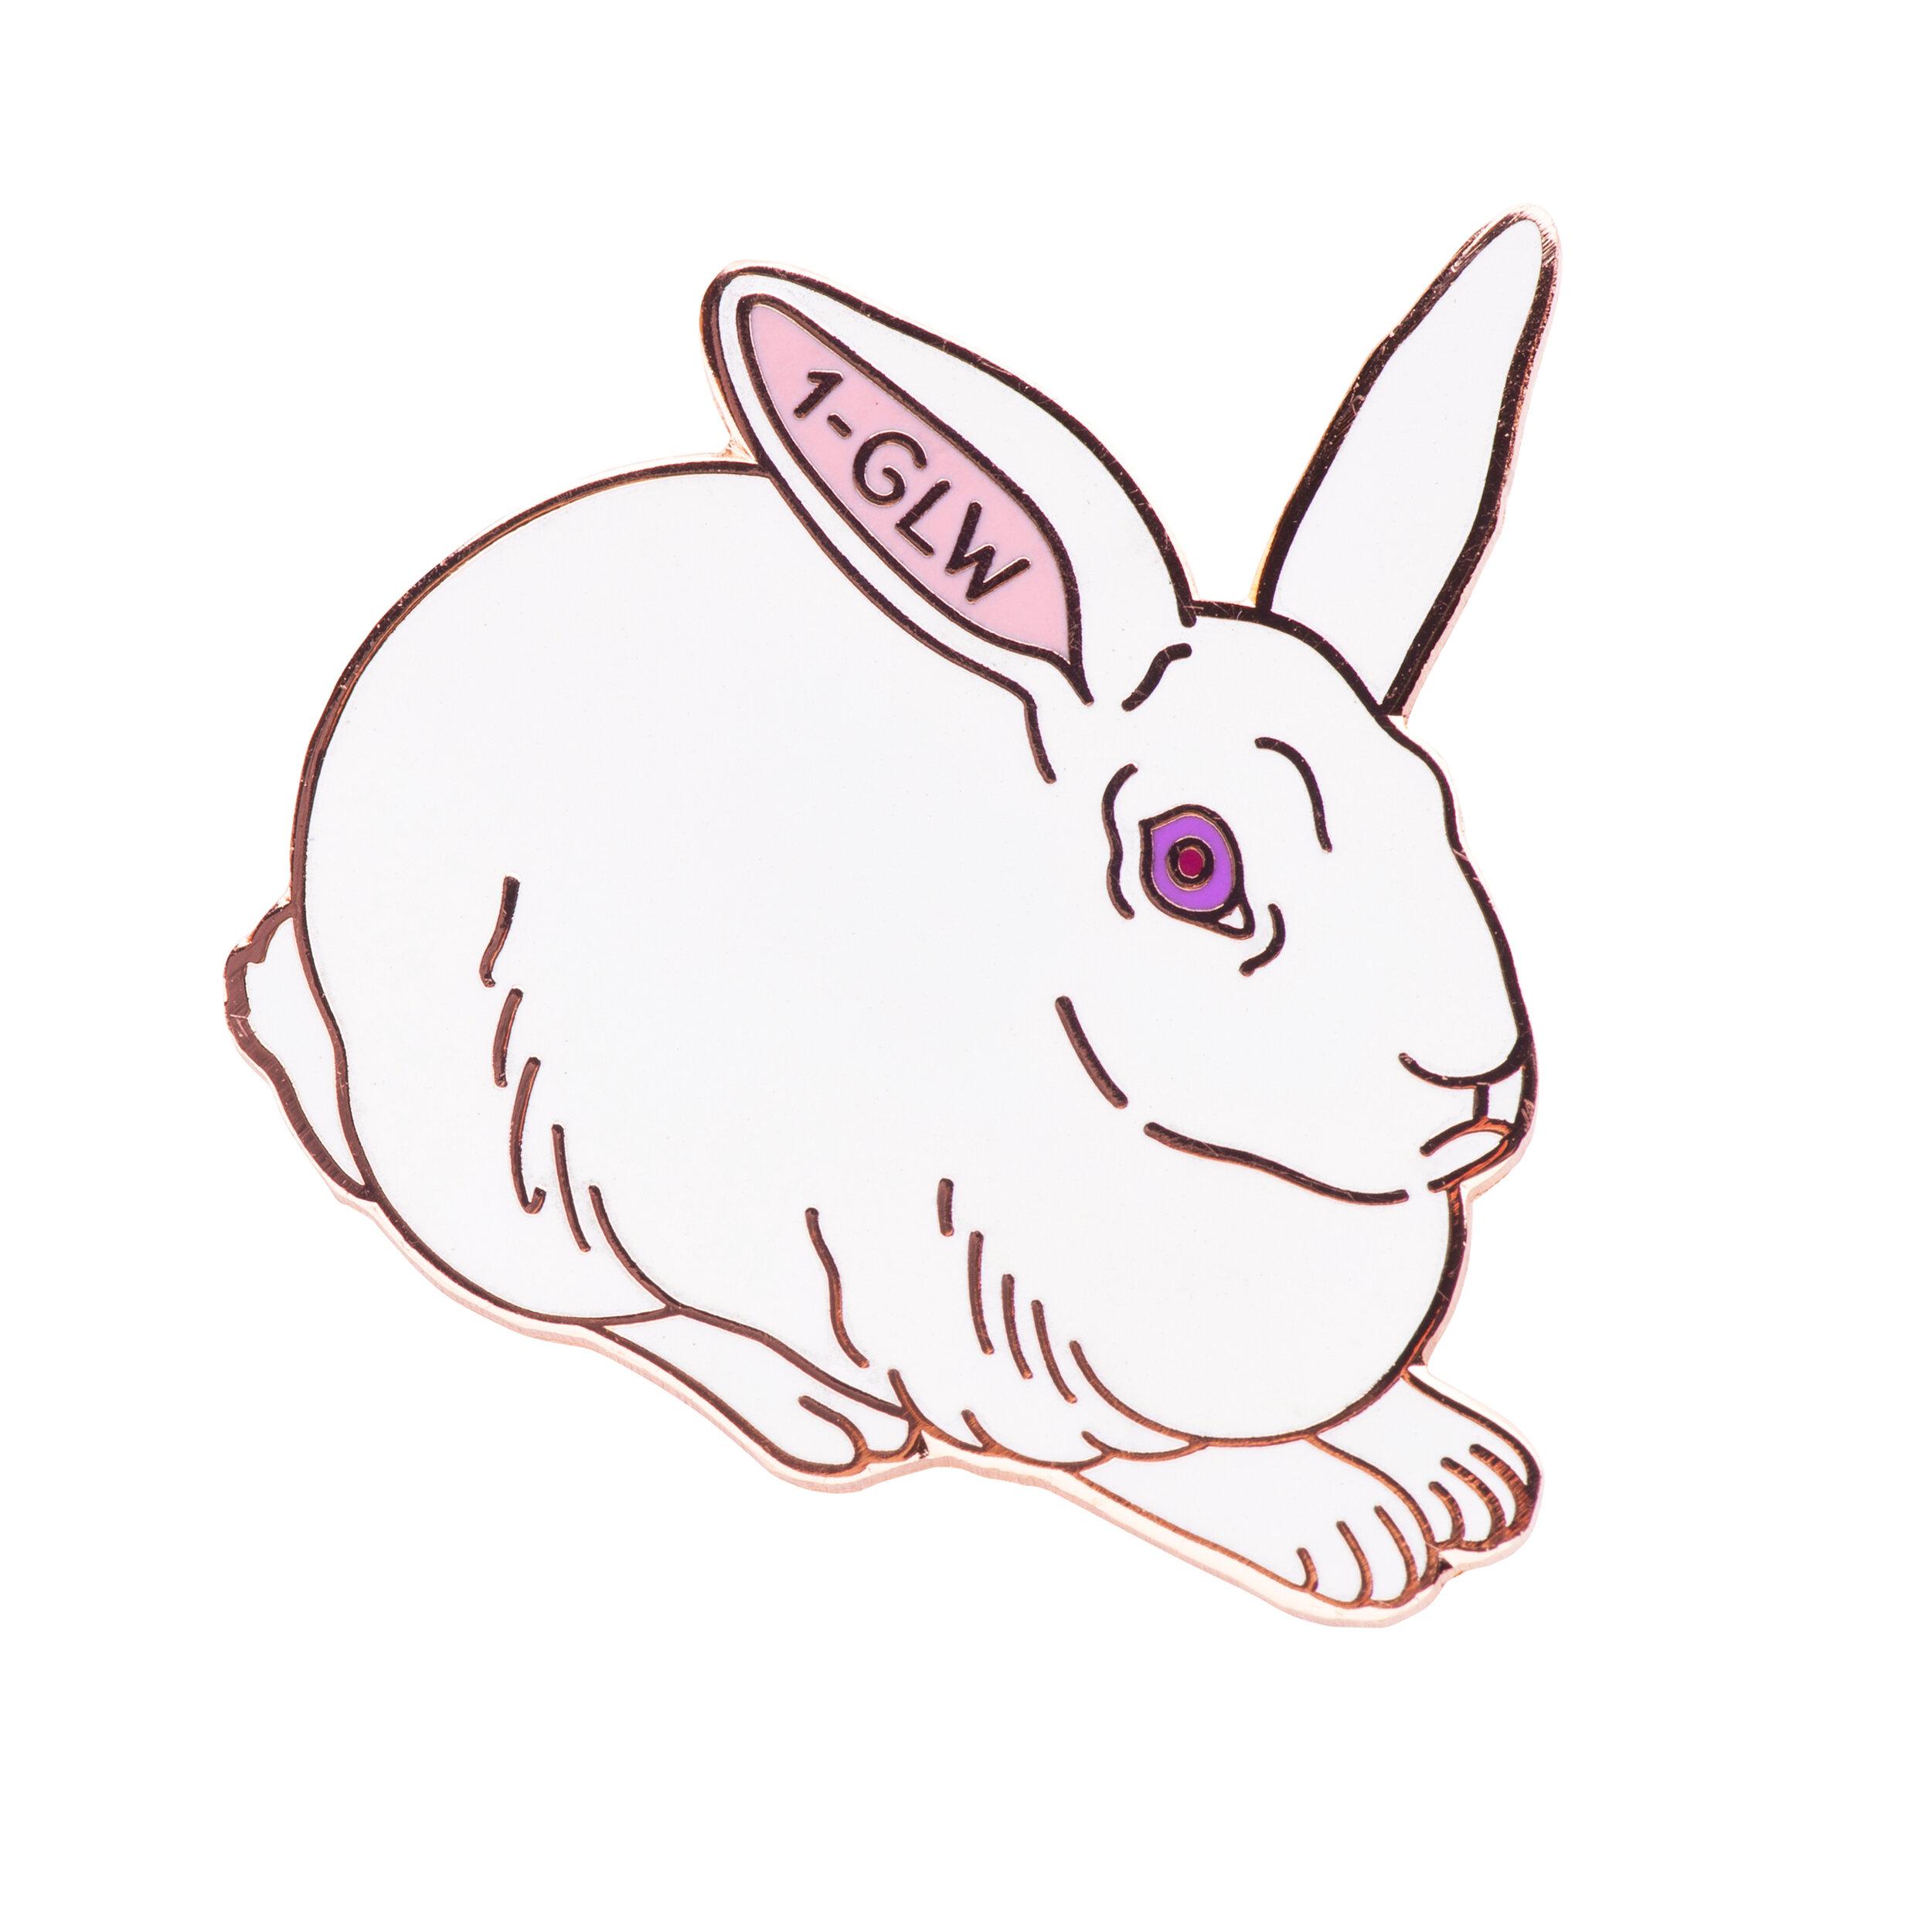 Lab Rabbit (glow-in-the-dark)